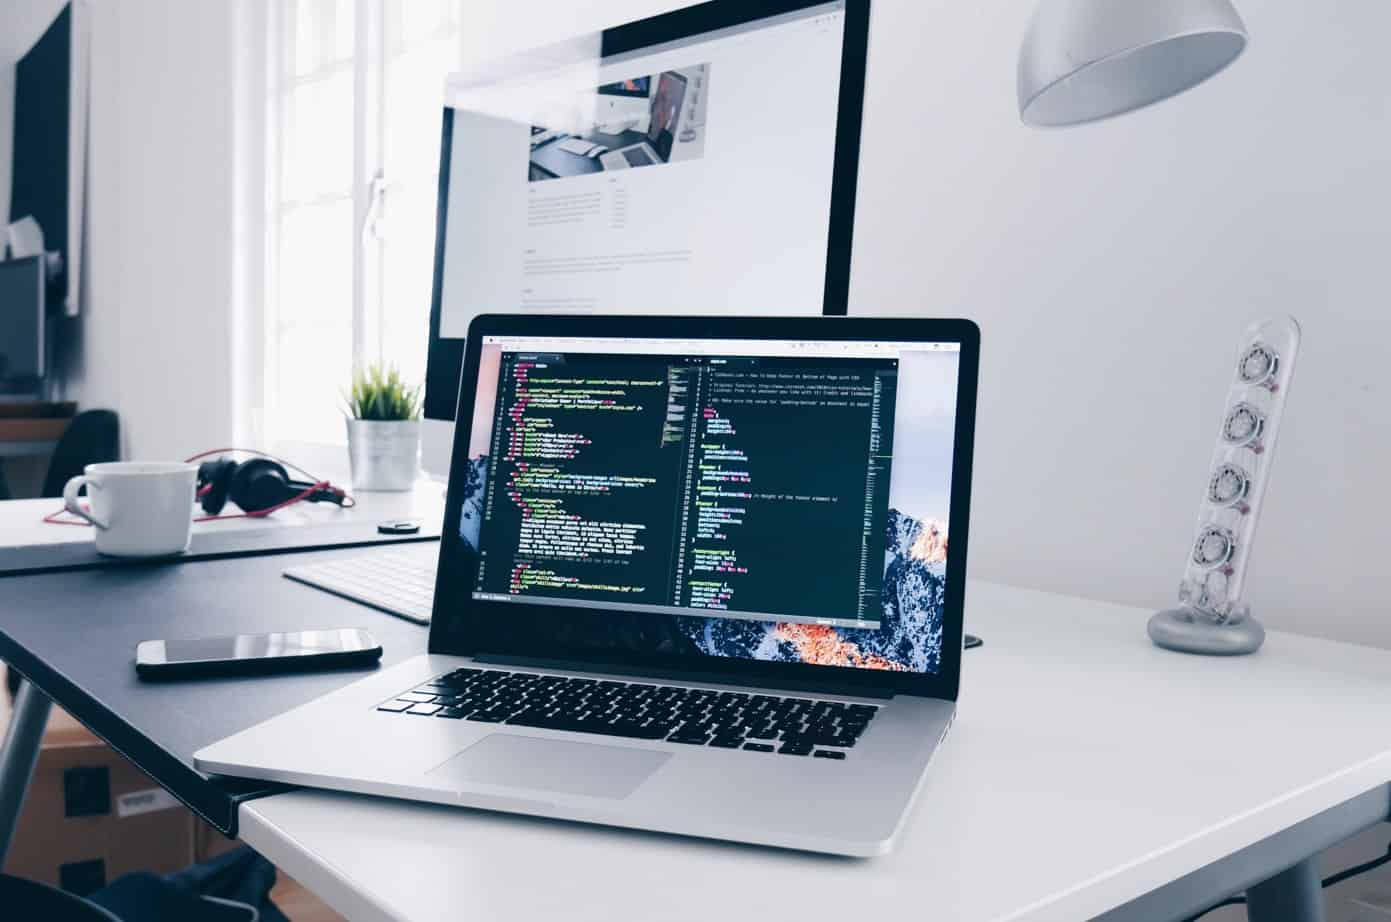 Top 18+ Best Free Online Python Courses & Certificates